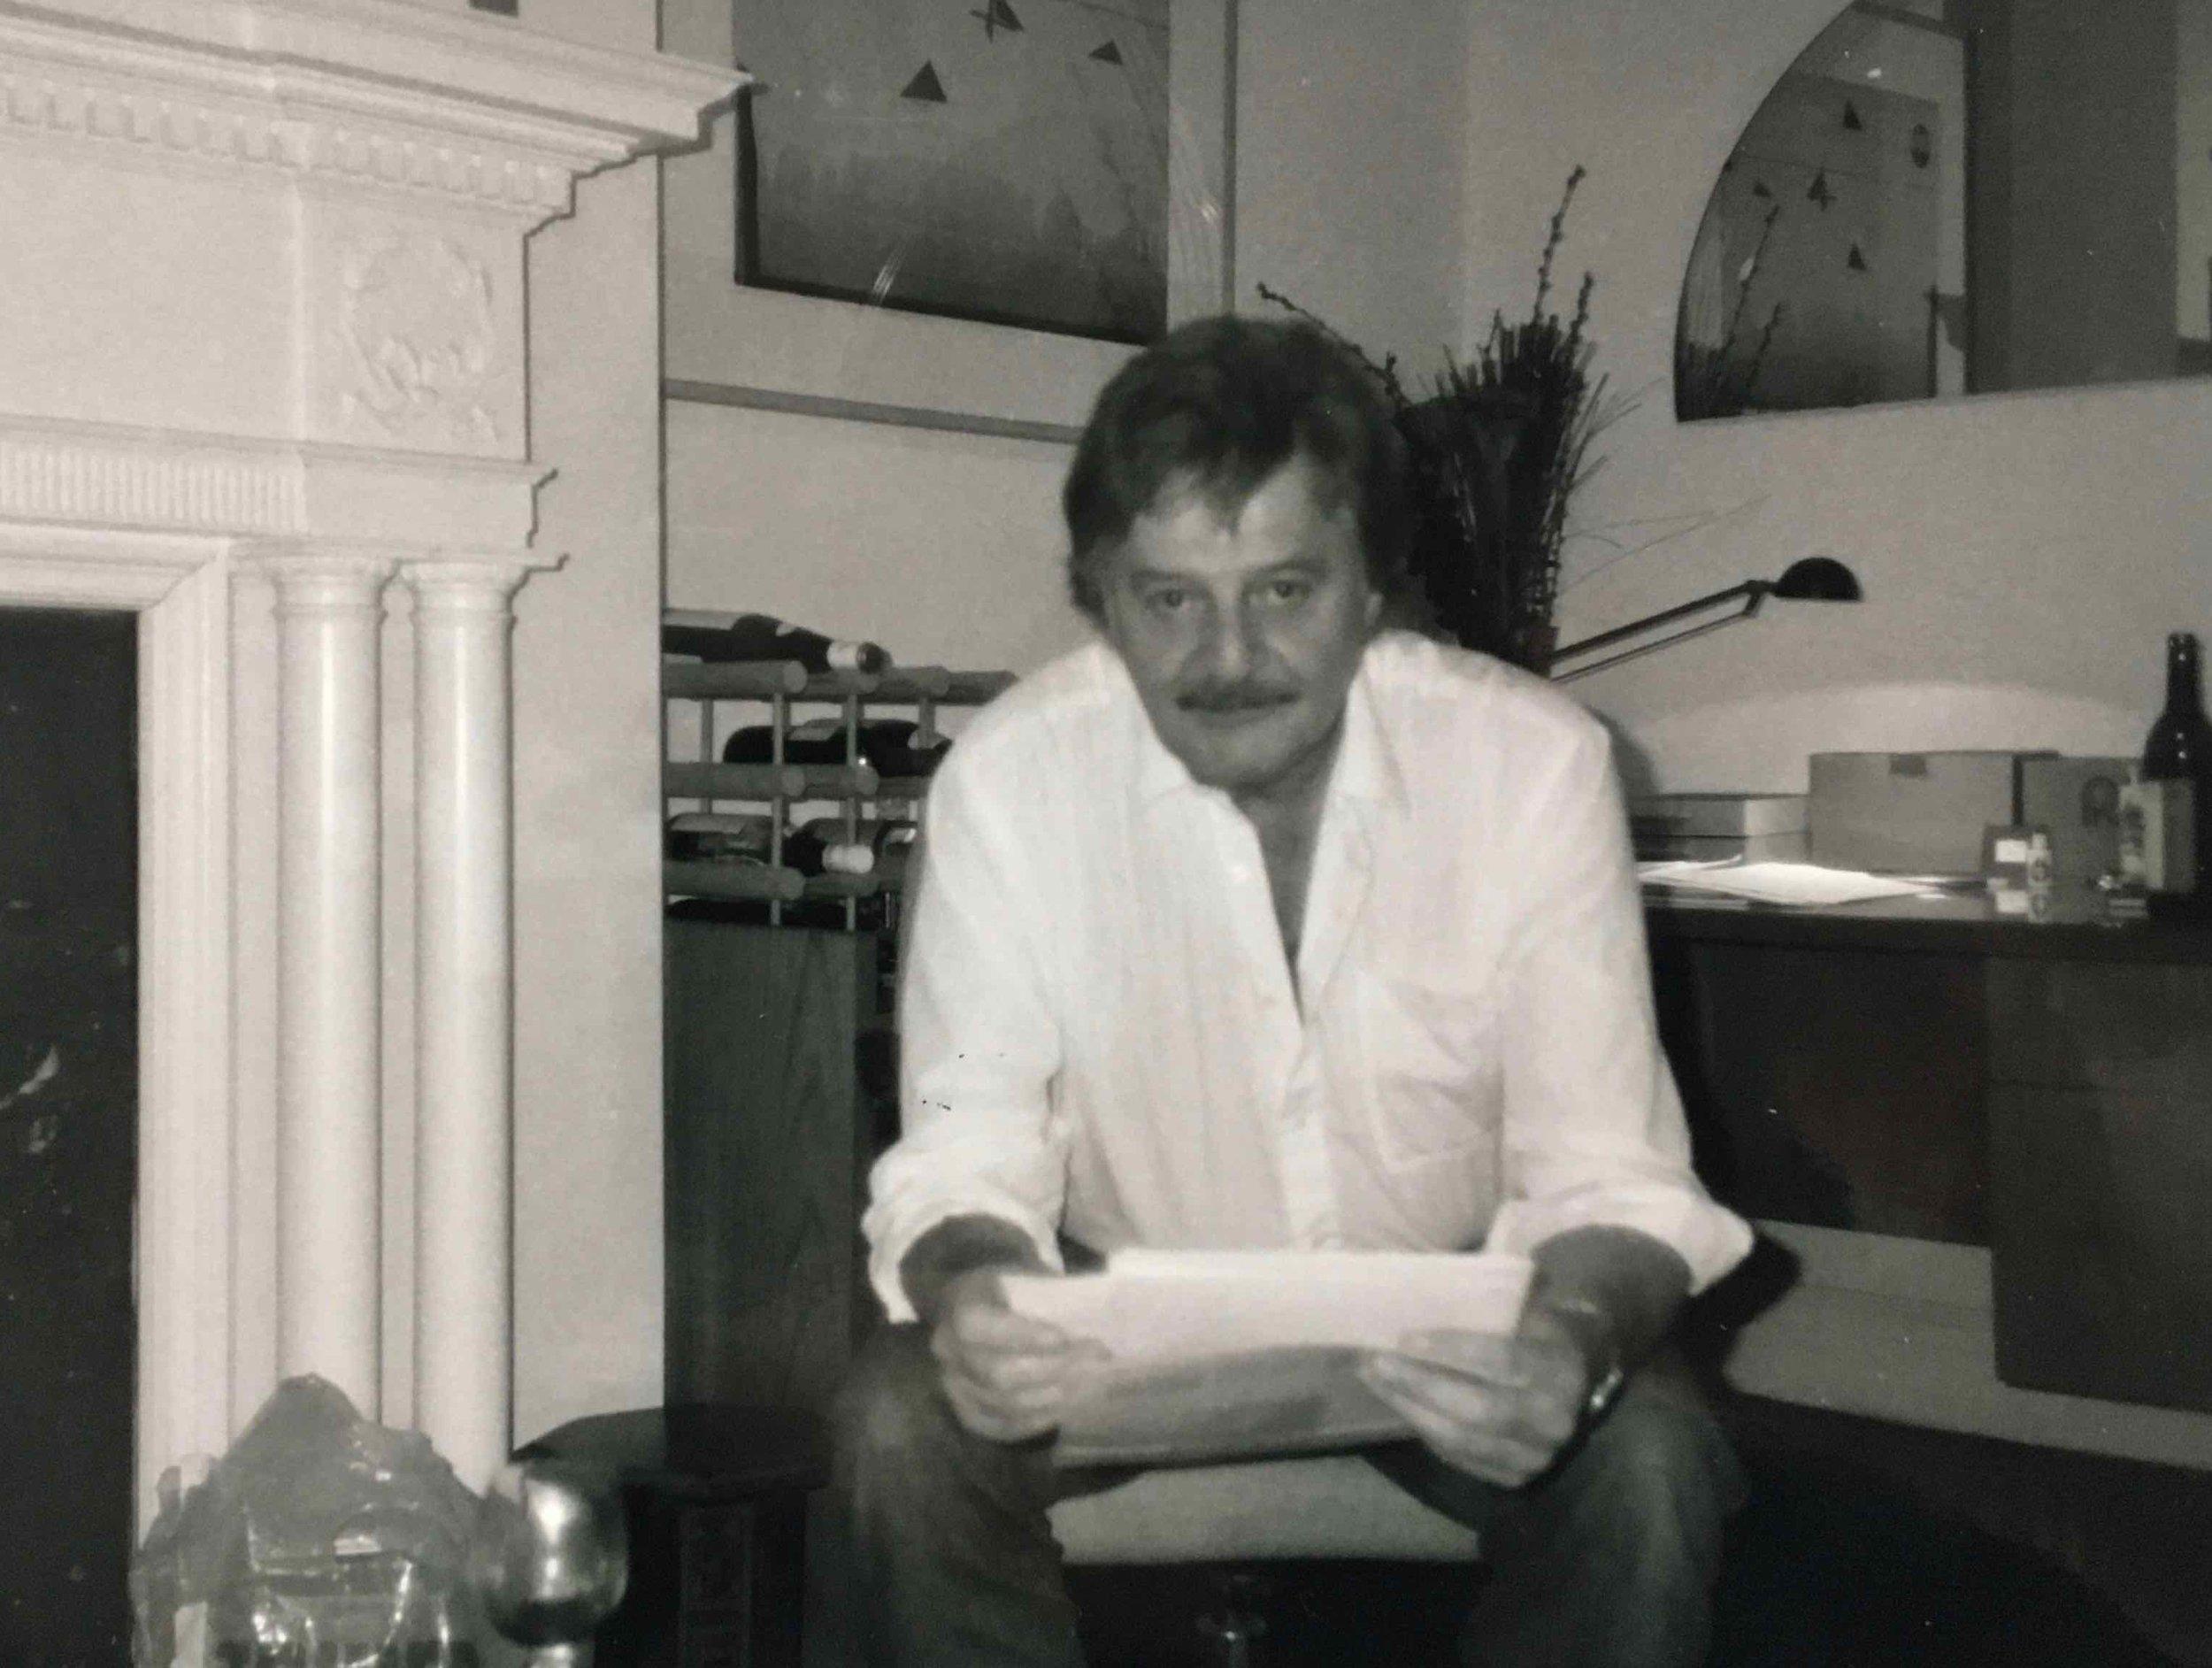 Australian composer Peter Sculthorpe, our wonderful friend